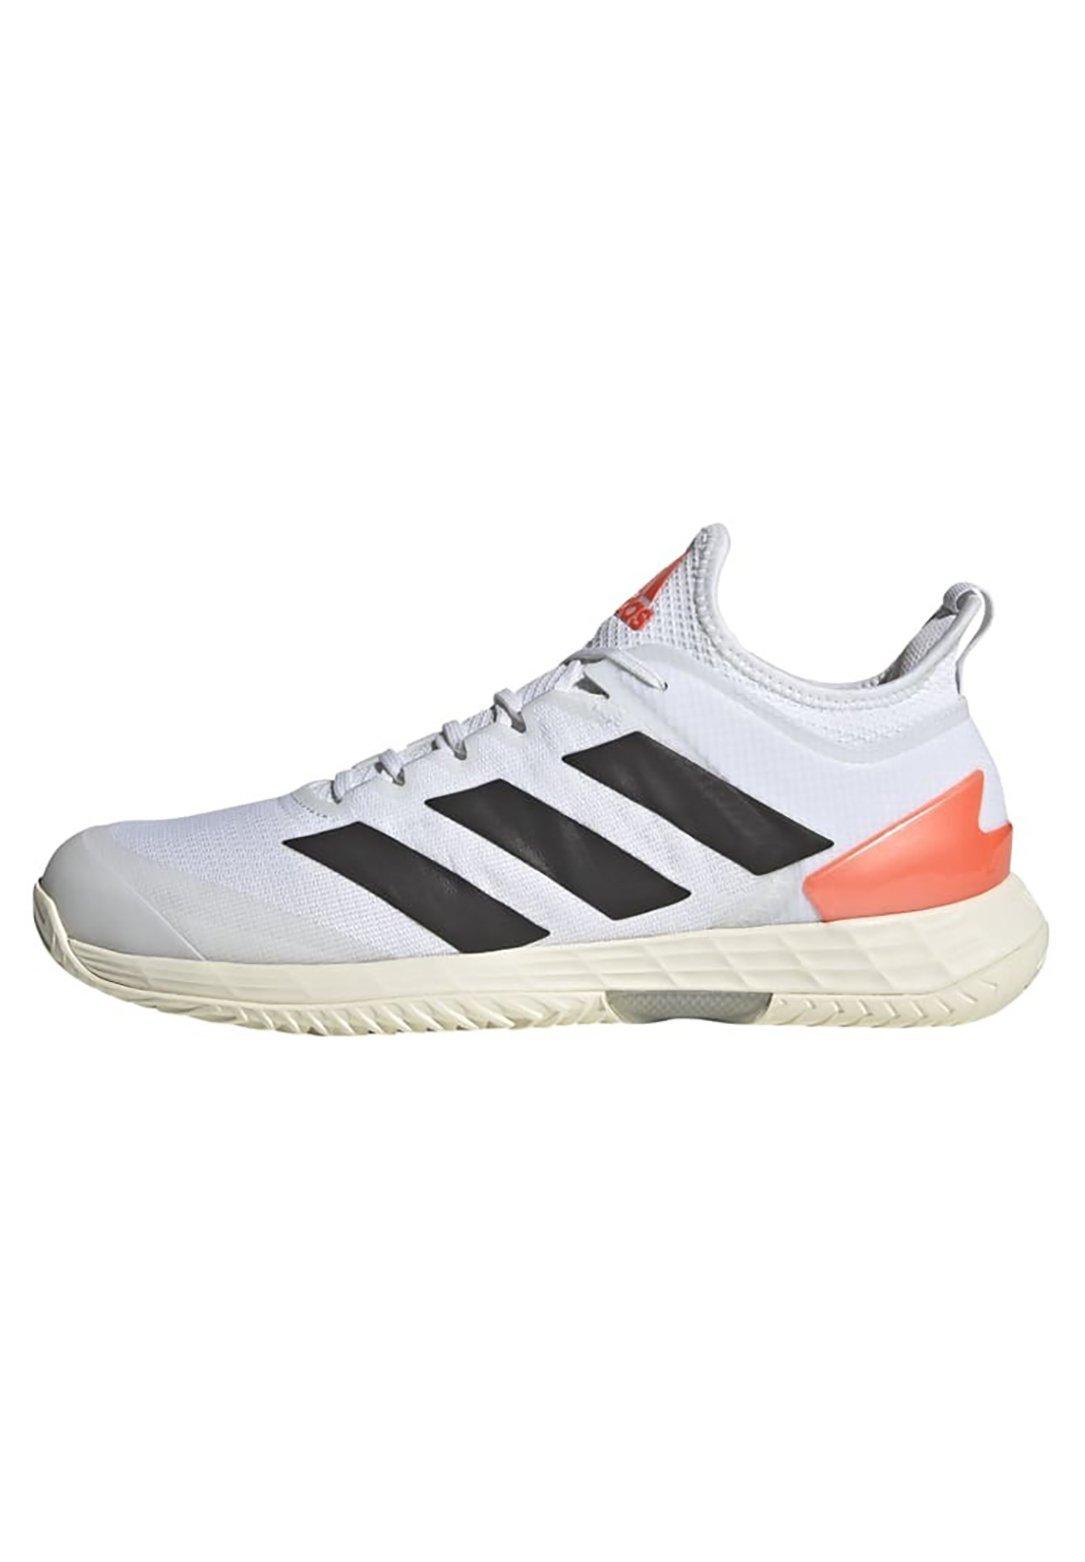 Men ADIZERO UBERSONIC 4 M - Clay court tennis shoes